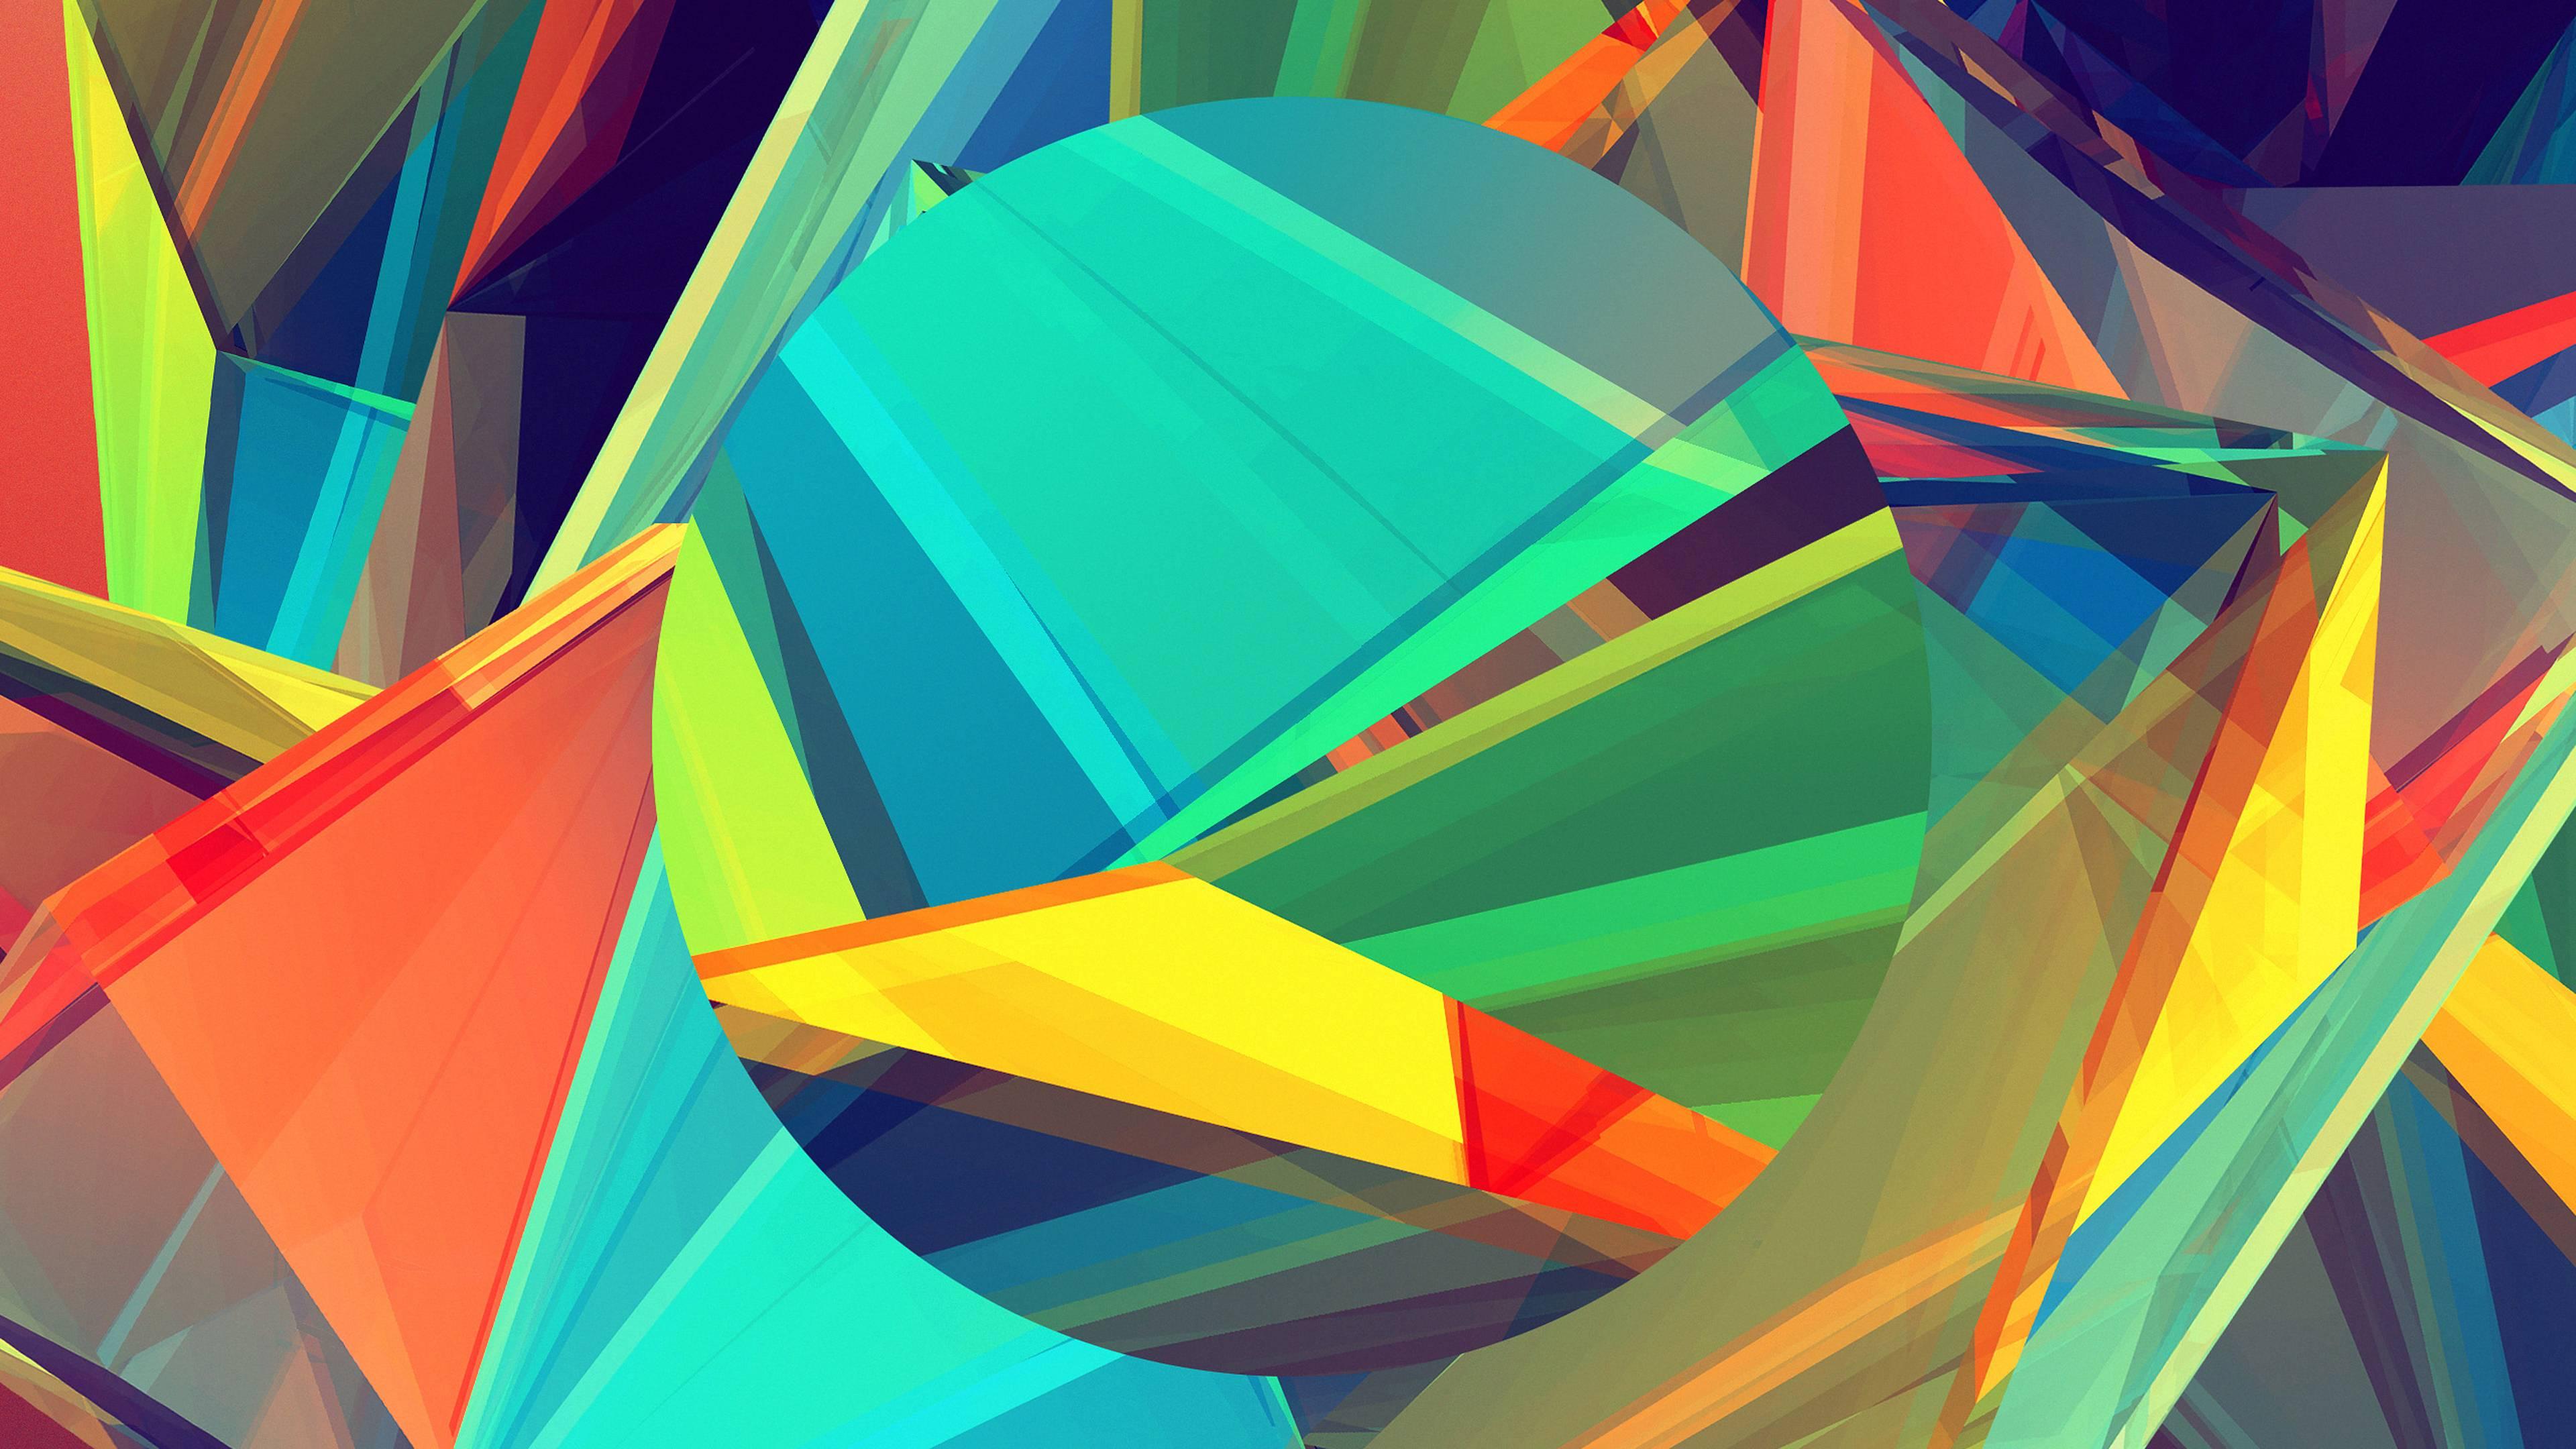 http://fs5.directupload.net/images/151007/uryos99u.jpg